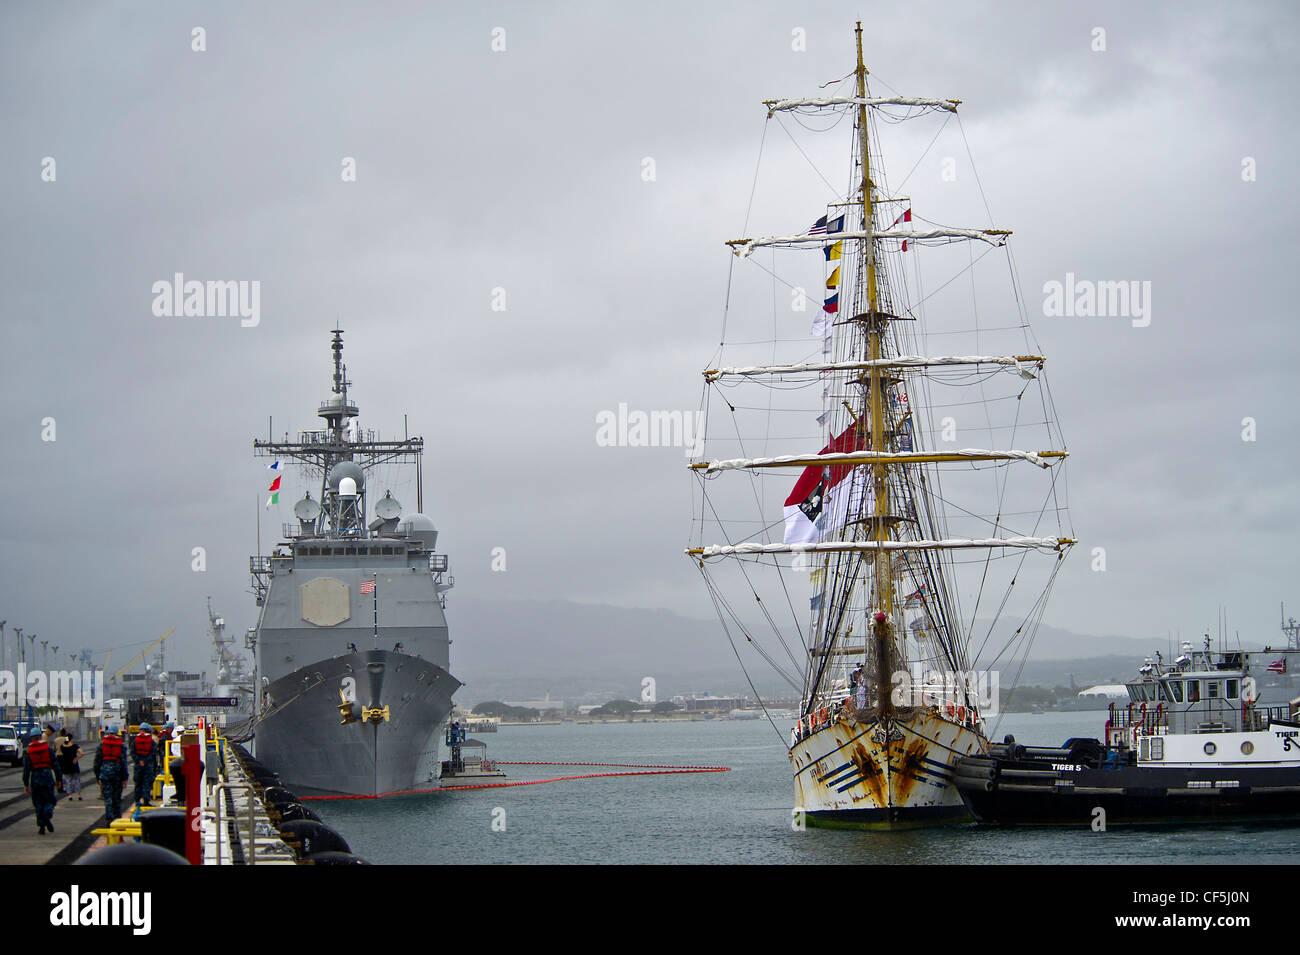 The Indonesian Navy tall ship, KRI Dewaruci arrives at Joint Base Pearl Harbor-Hickam, Hawaii on Feb. 29, 2012, - Stock Image